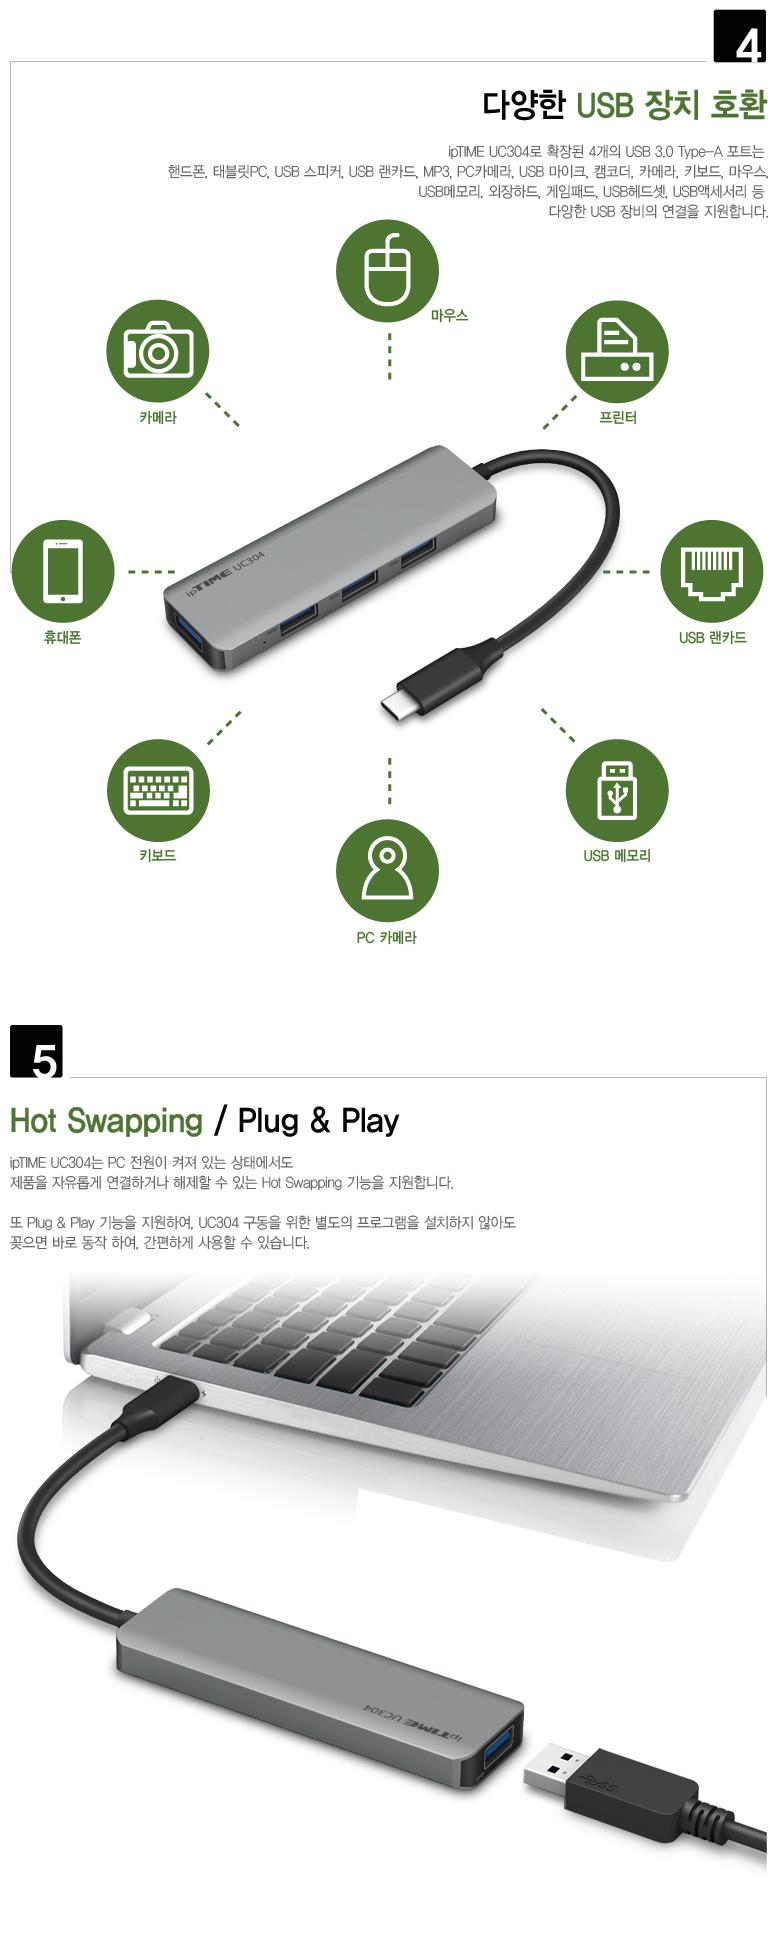 EFM ipTIME UC304 (4포트/USB 3.0 Type C)